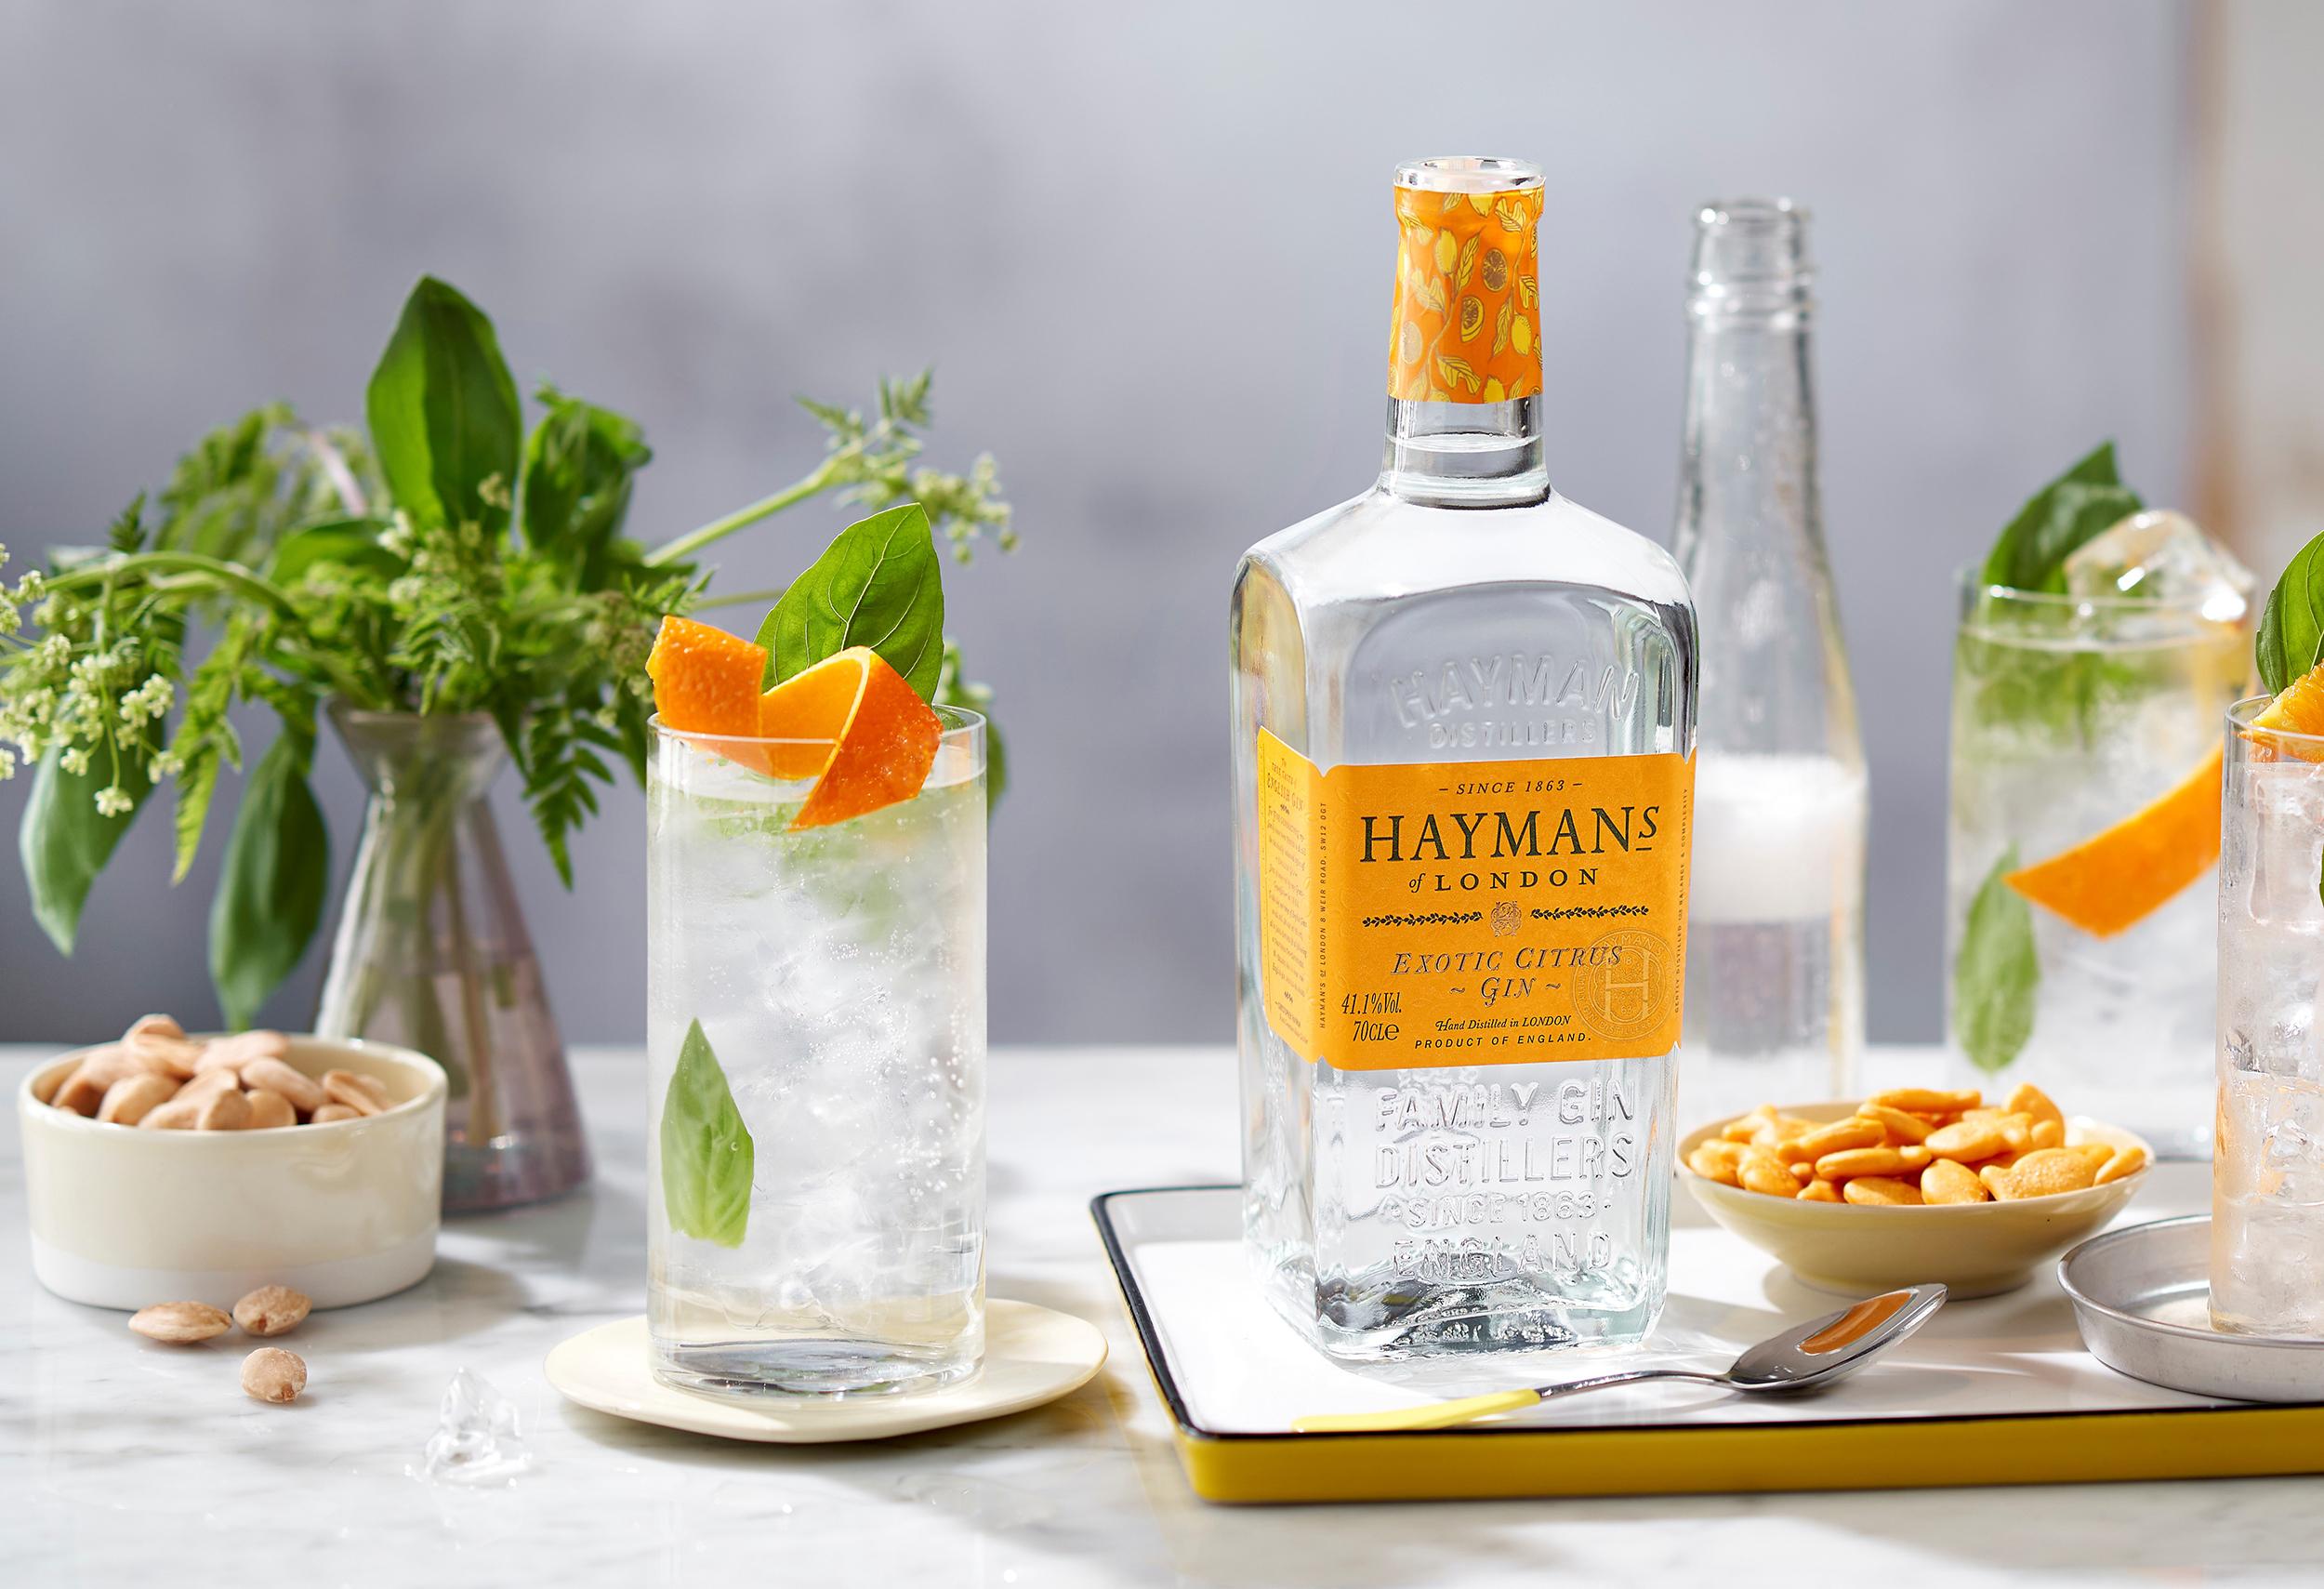 Hayman's Exotic Citrus G&T